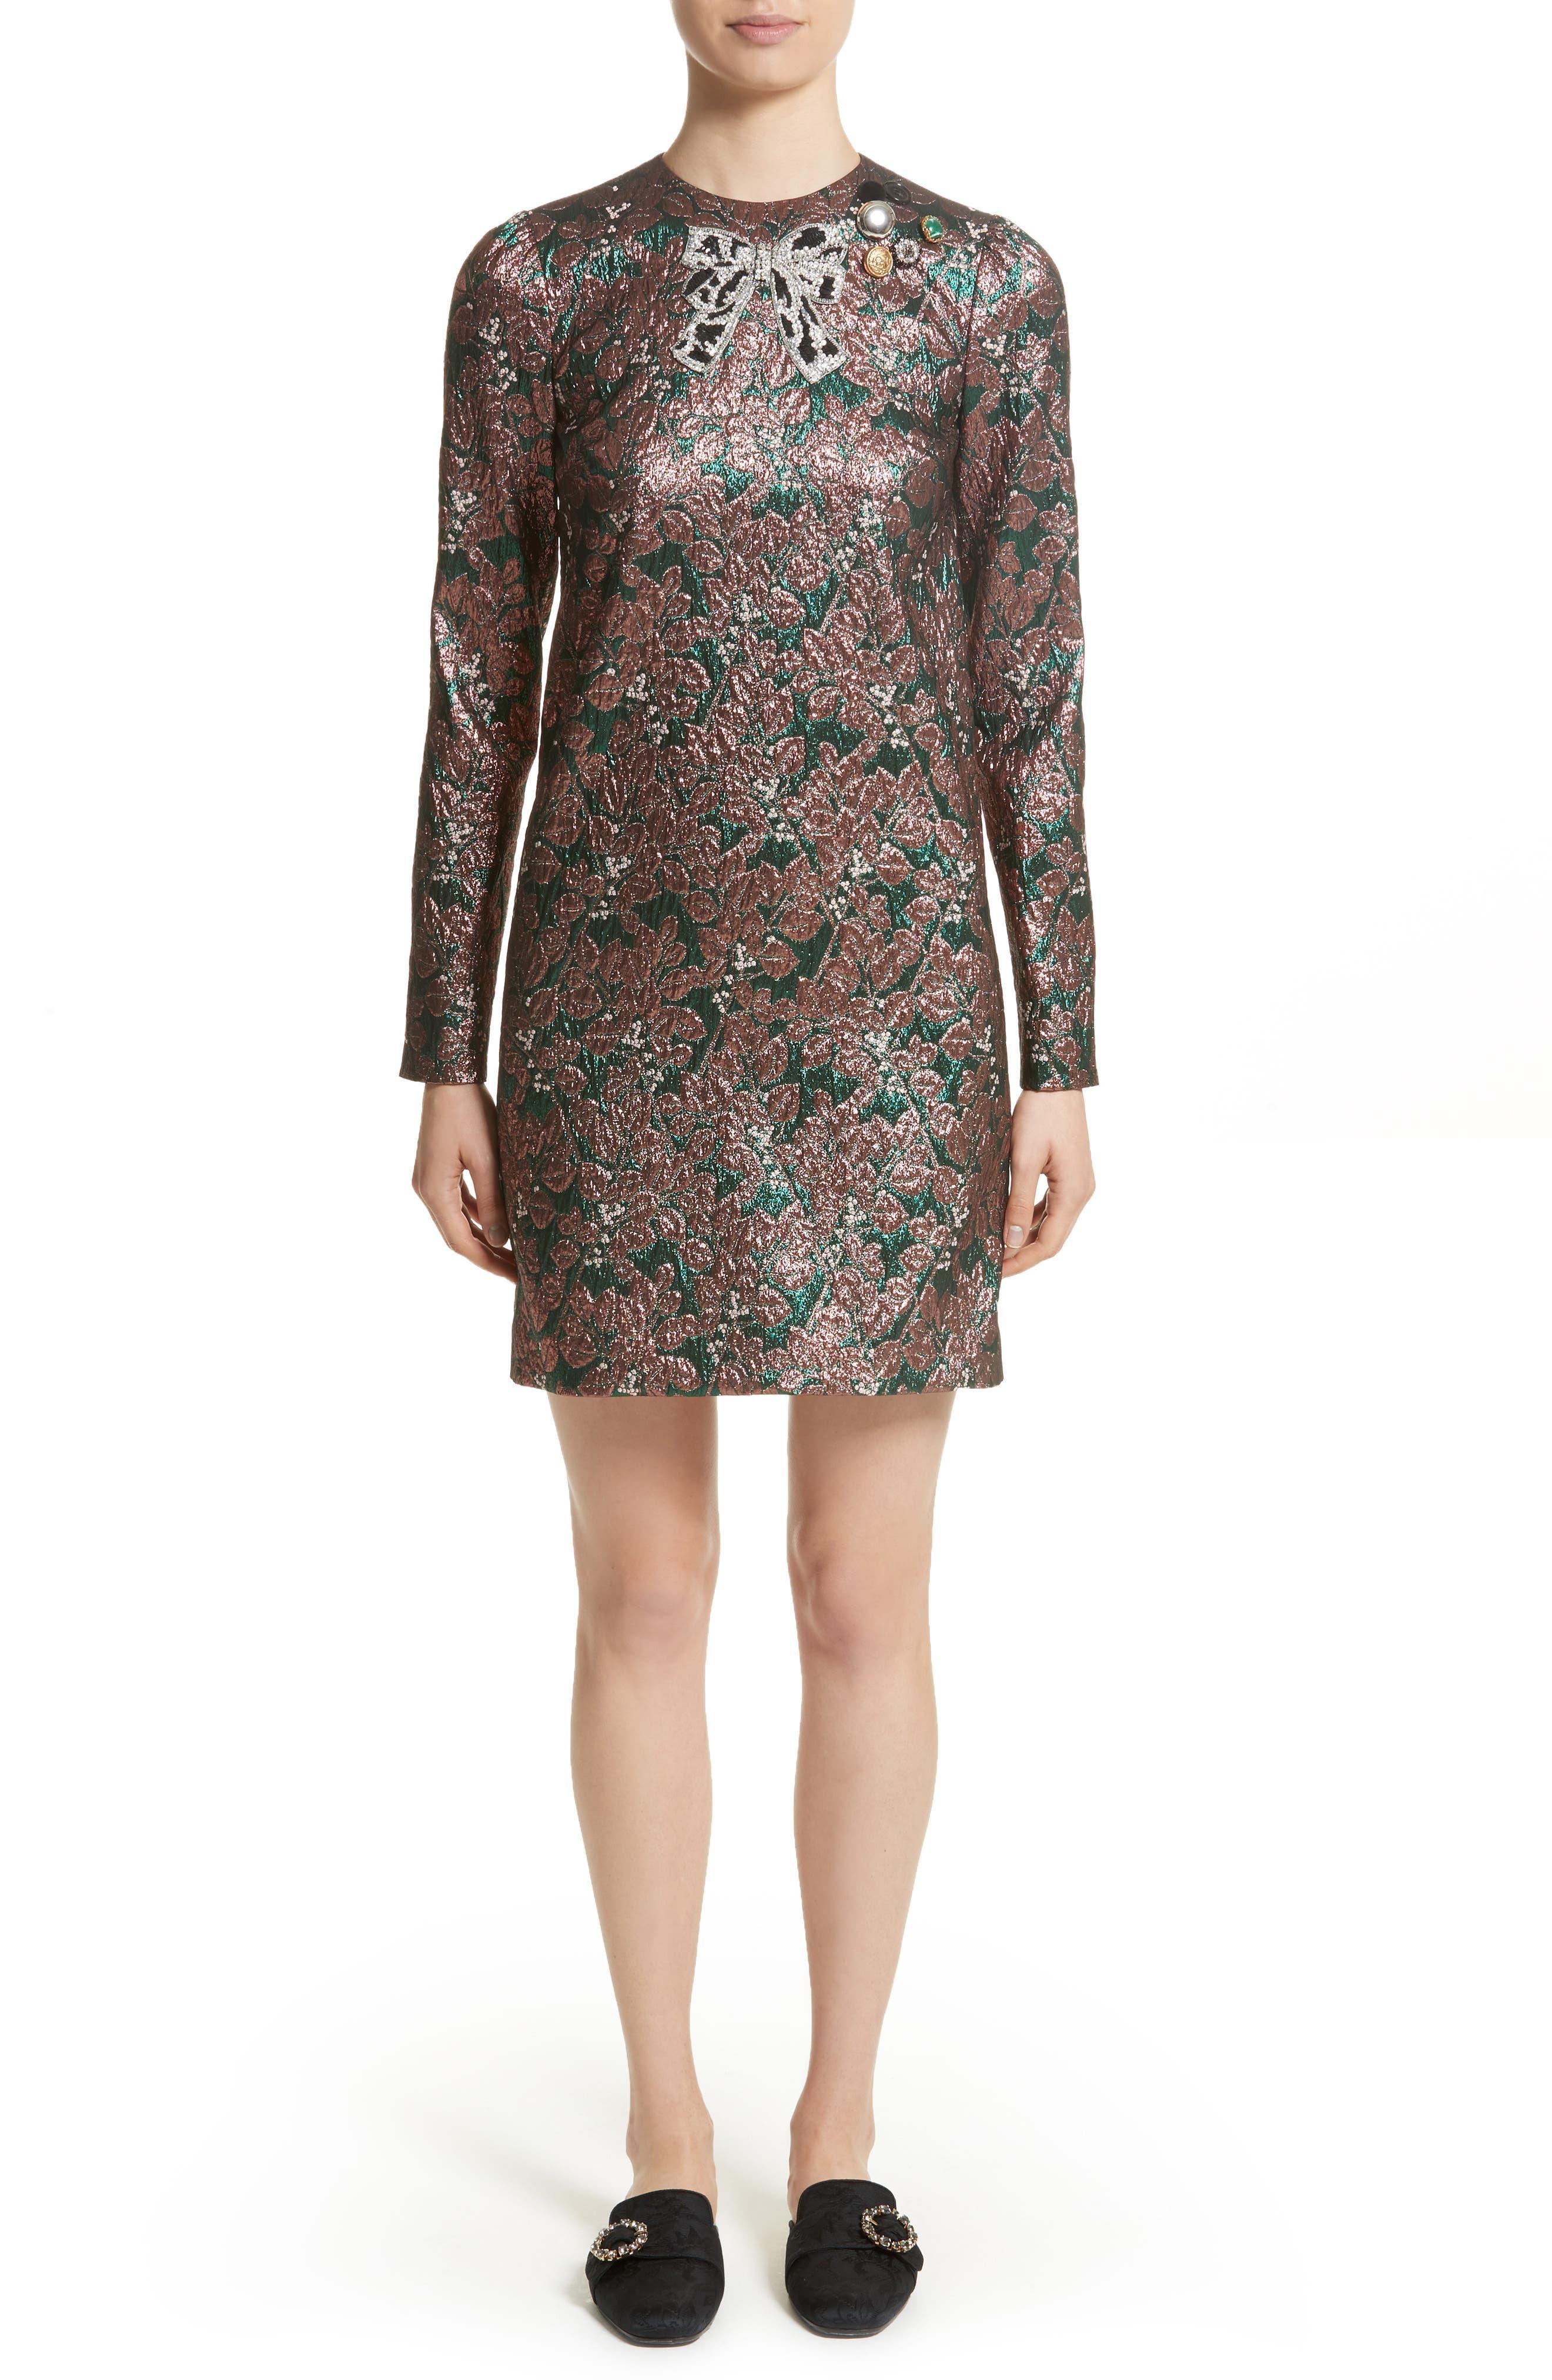 Dolce&Gabbana Embellished Metallic Jacquard Minidress